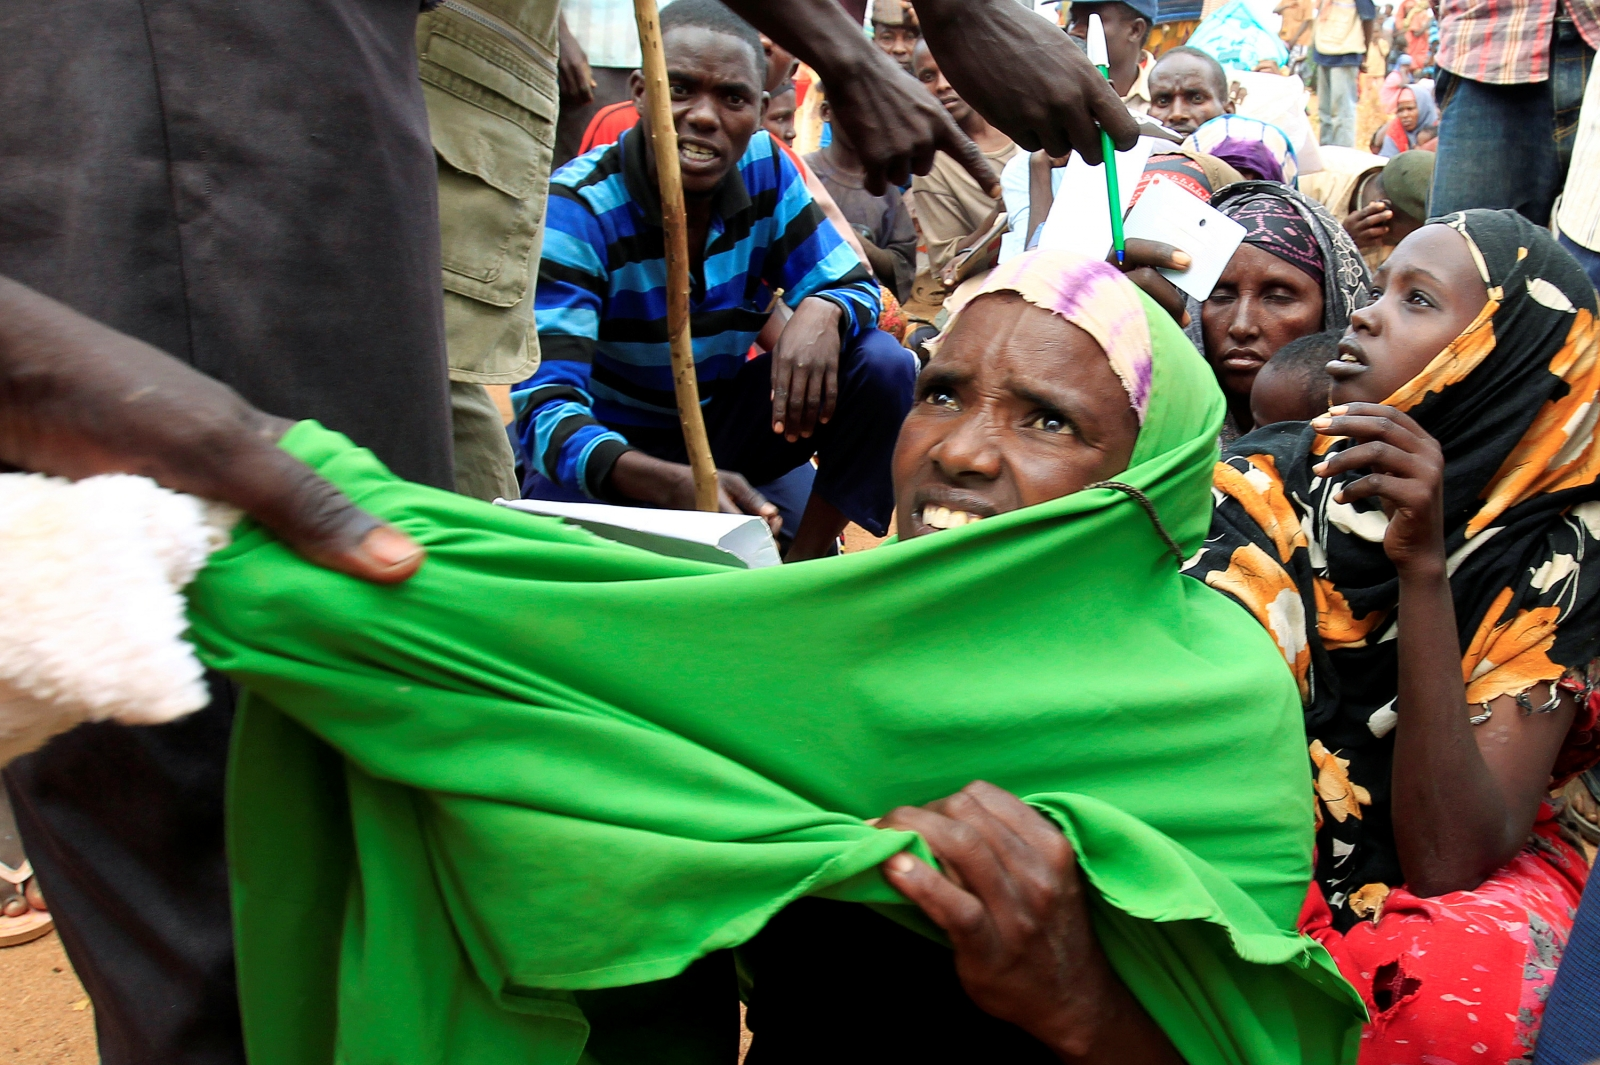 Somali refugees Kenya